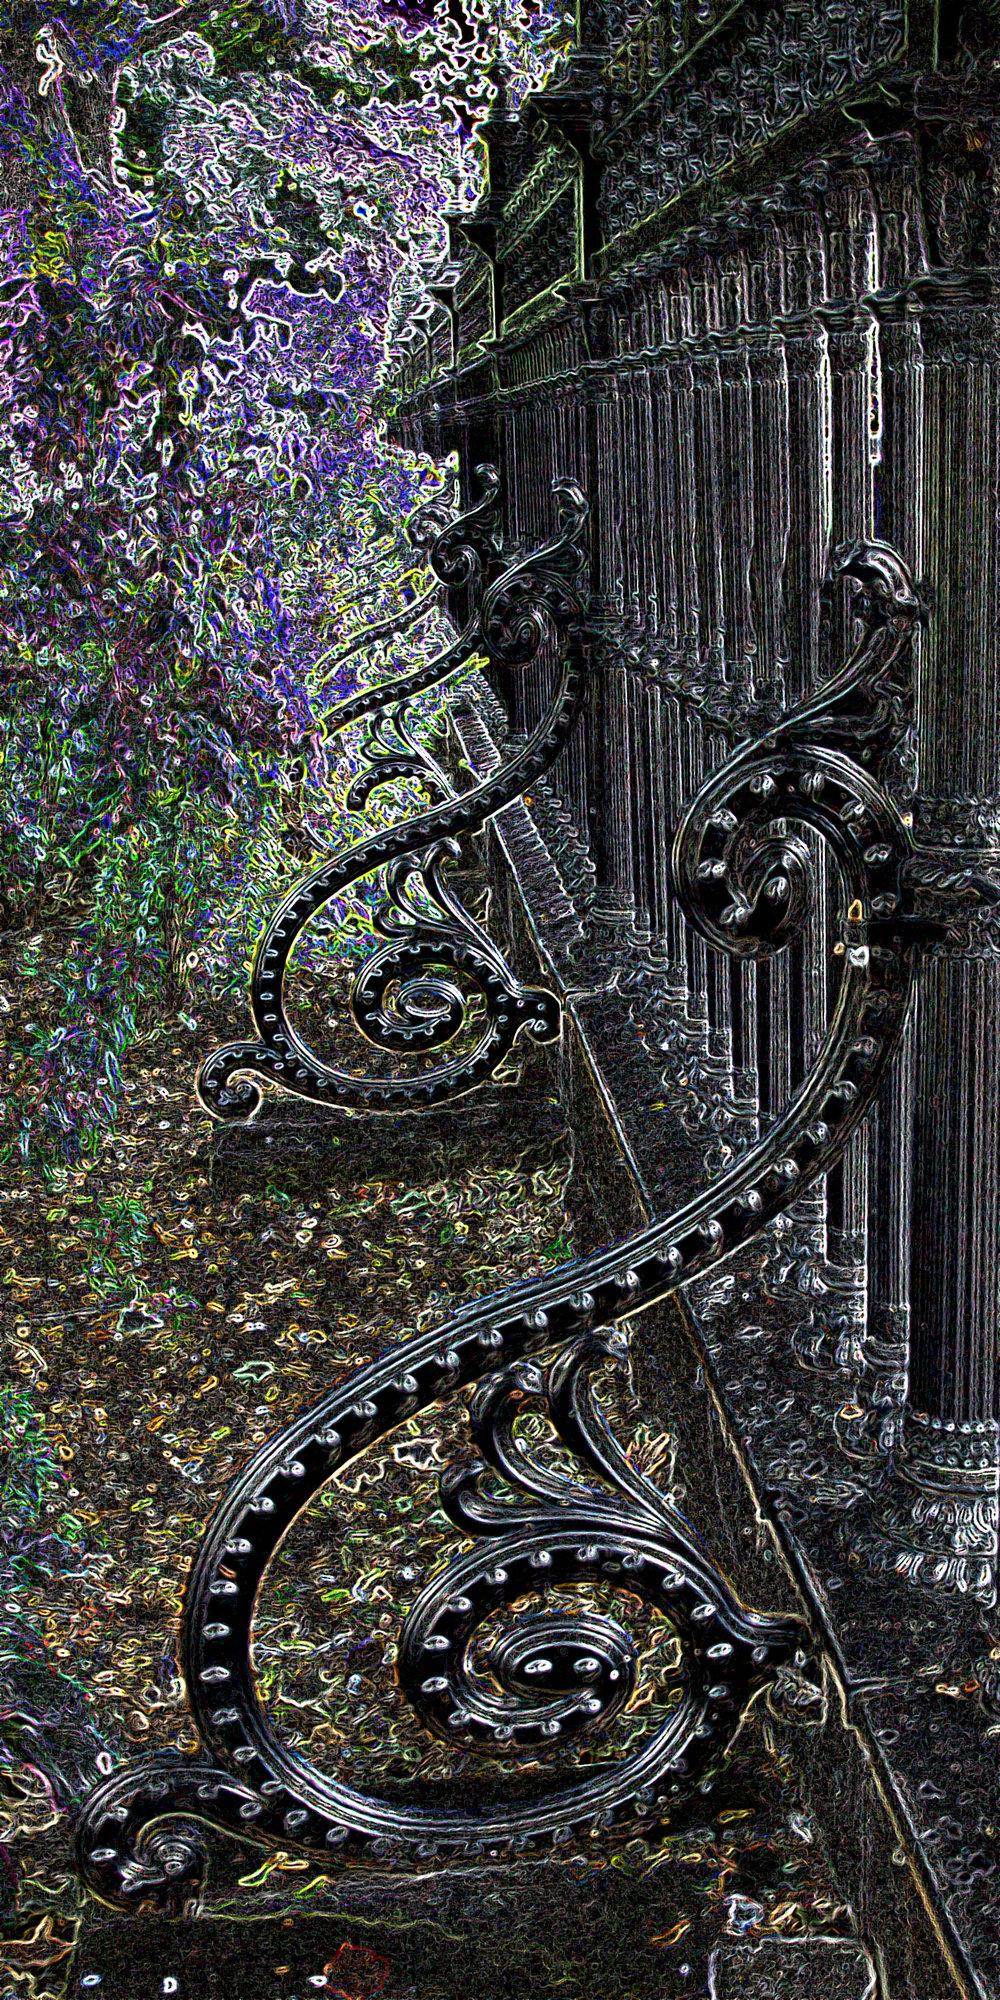 _DSC7331 Osgood Fence original 16 x 7 Glow.jpg